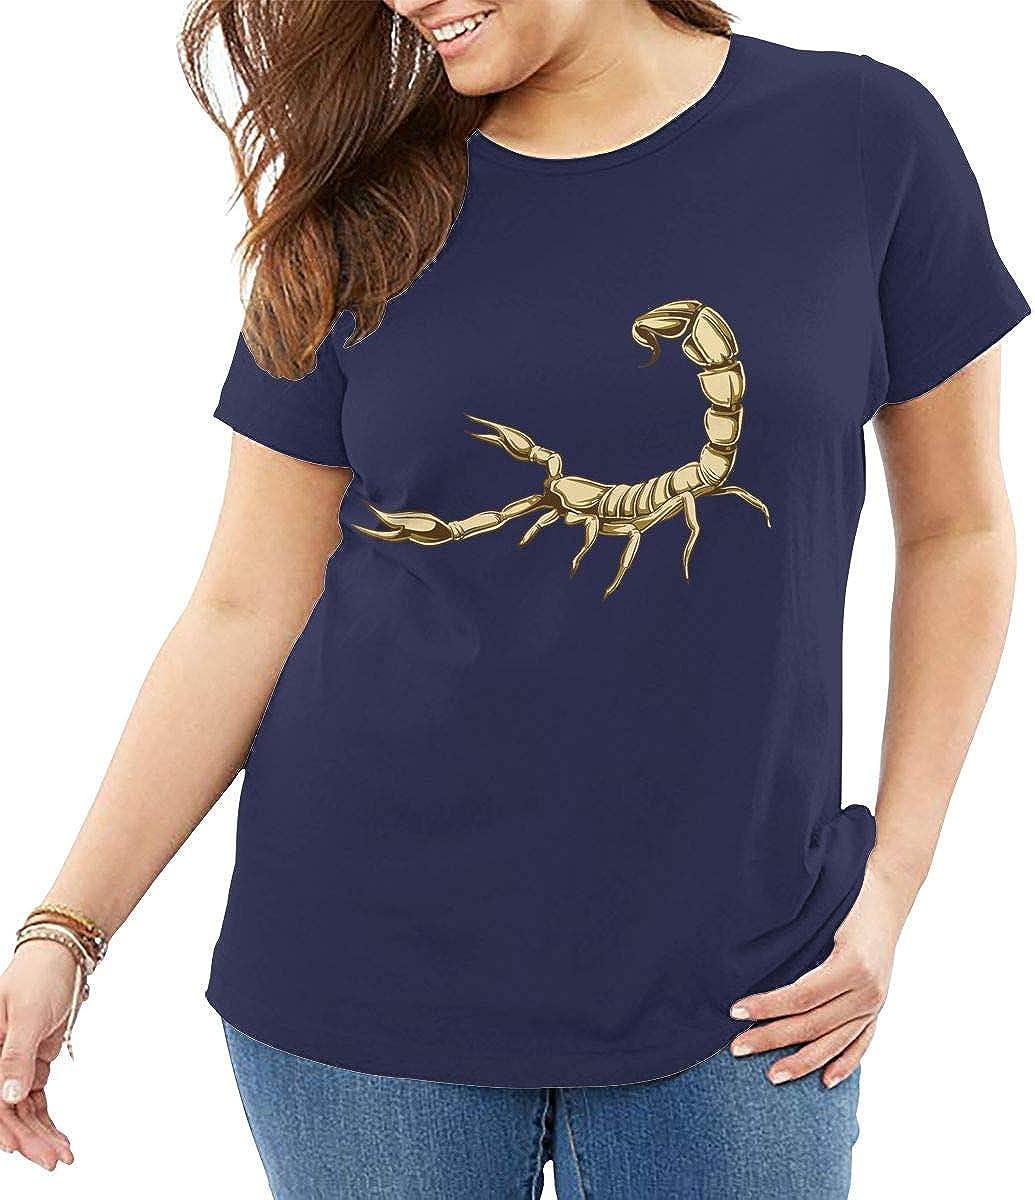 Womens Fashion Big Size Short Slim Fit Tee Casual Short Sleeve Scorpion Graphic Tee Shirts XL-6XL